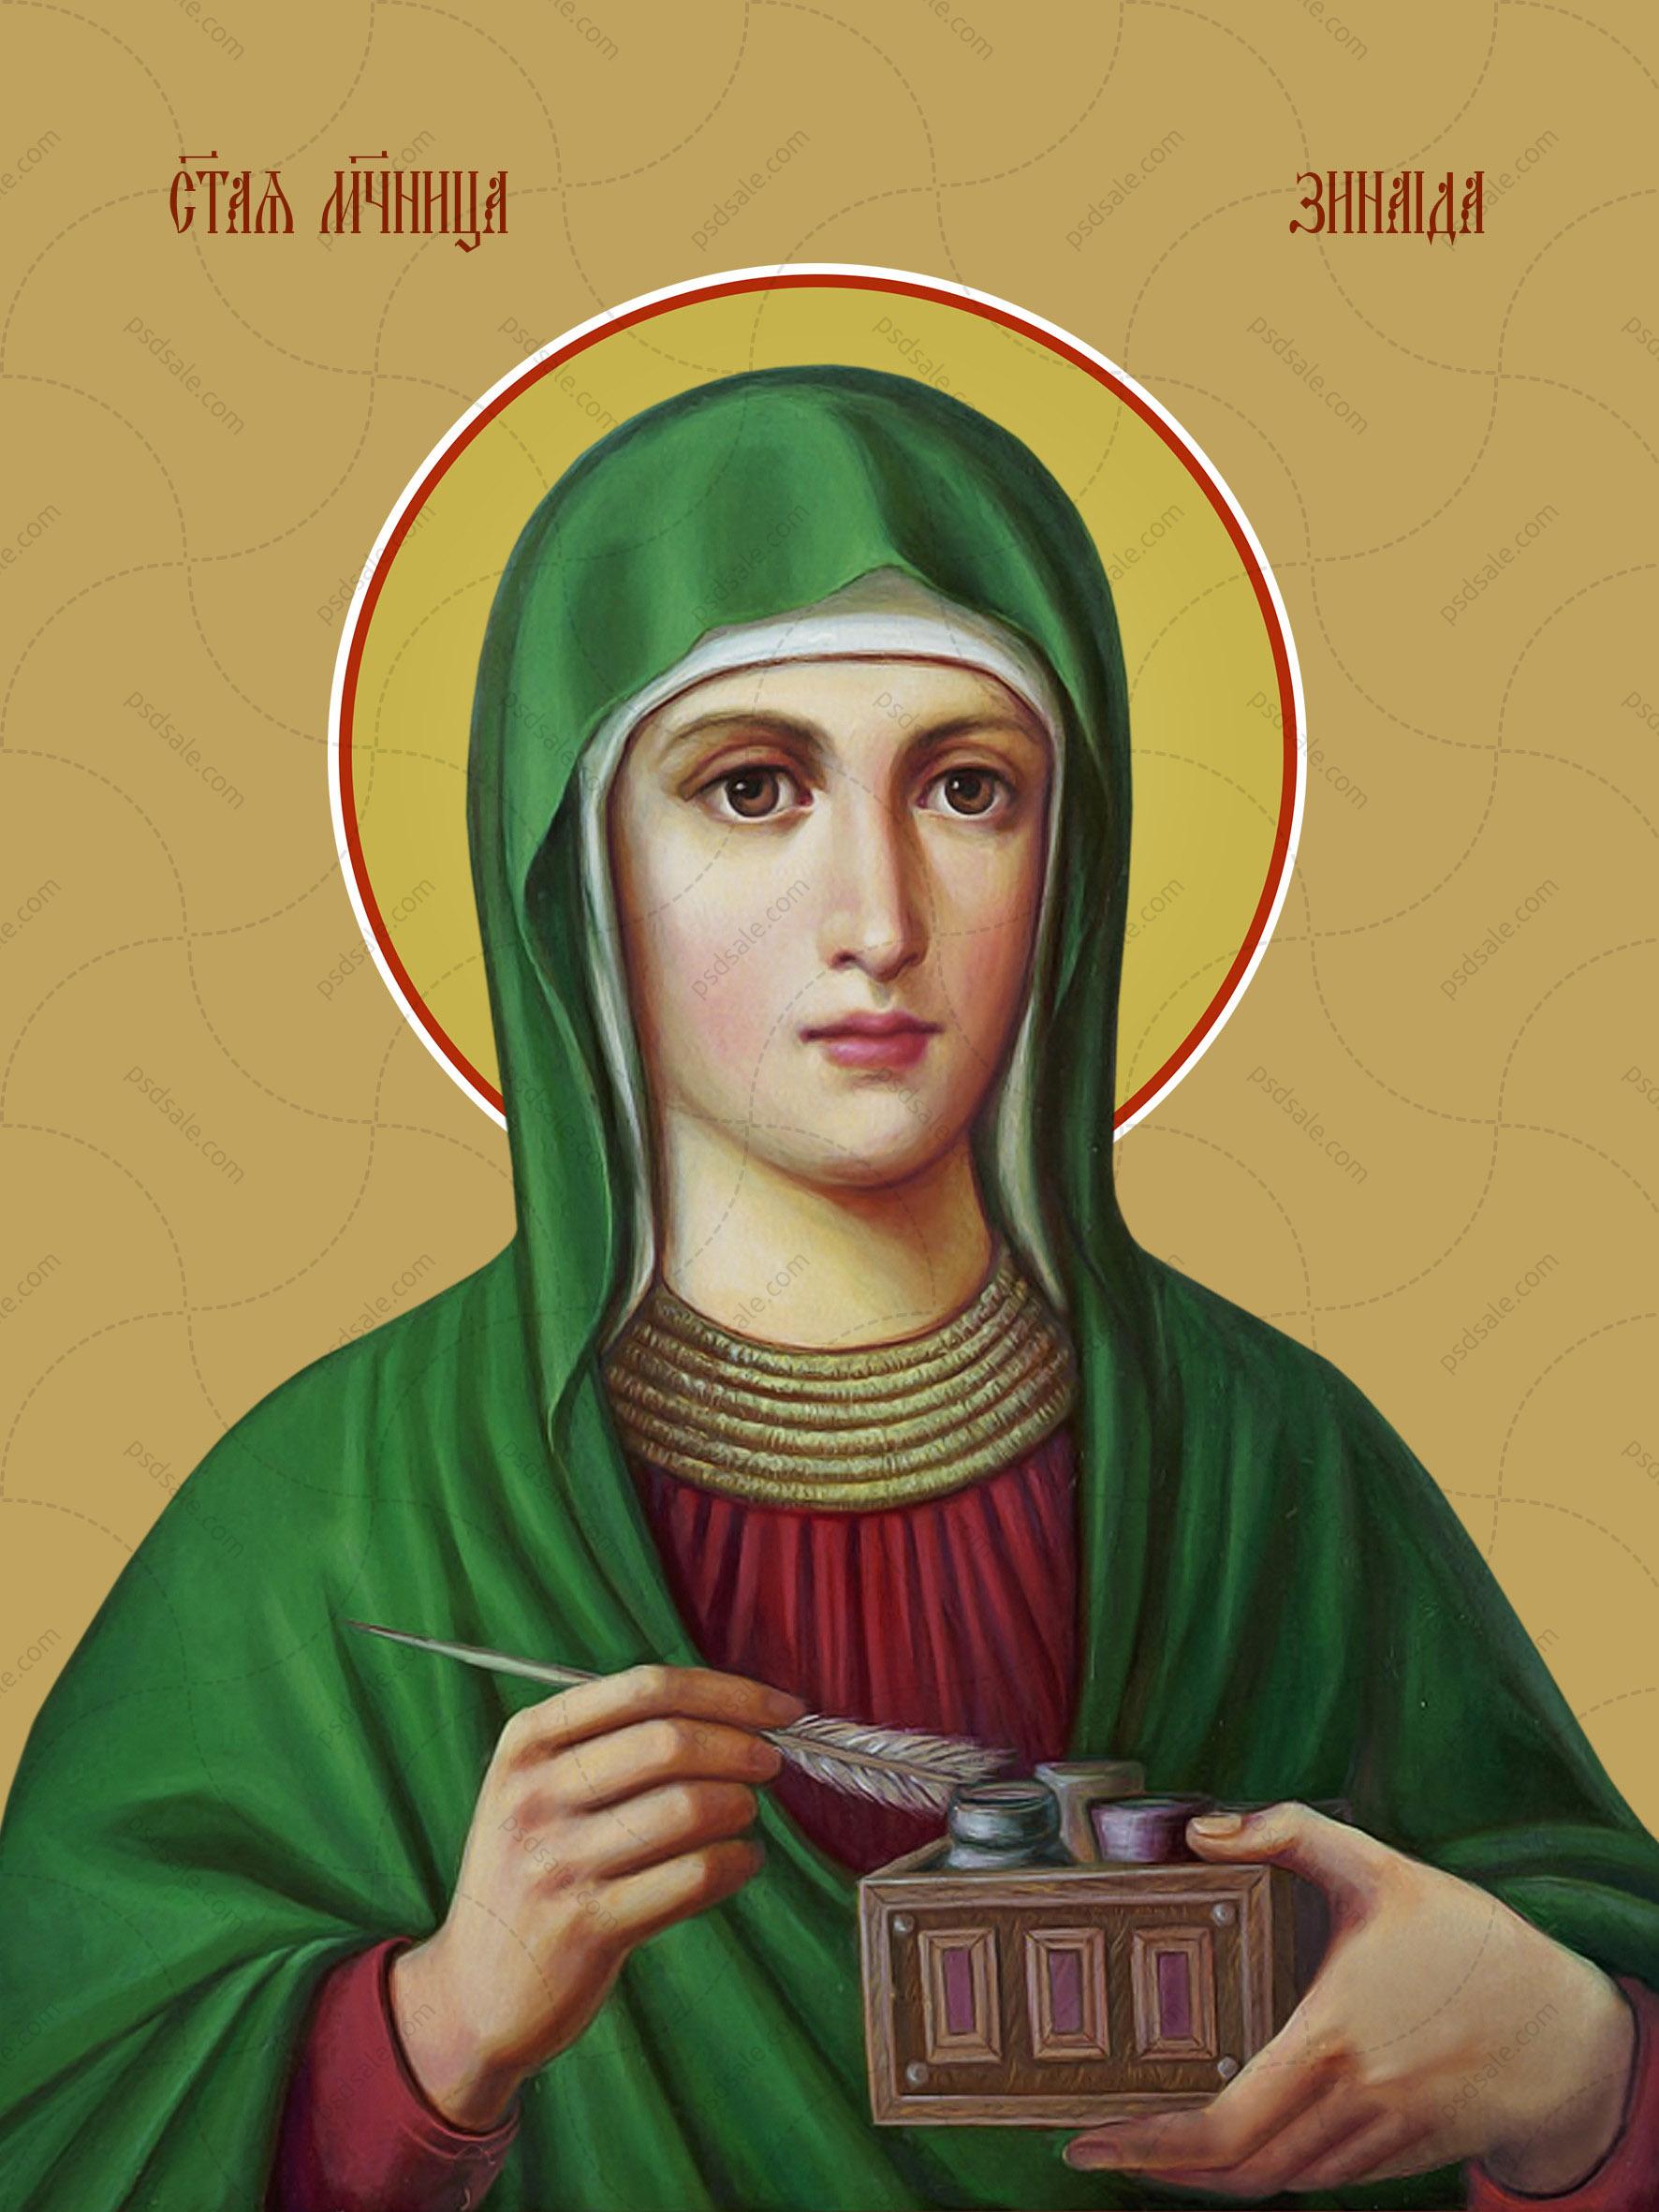 Зинаида Тарсийская, святая